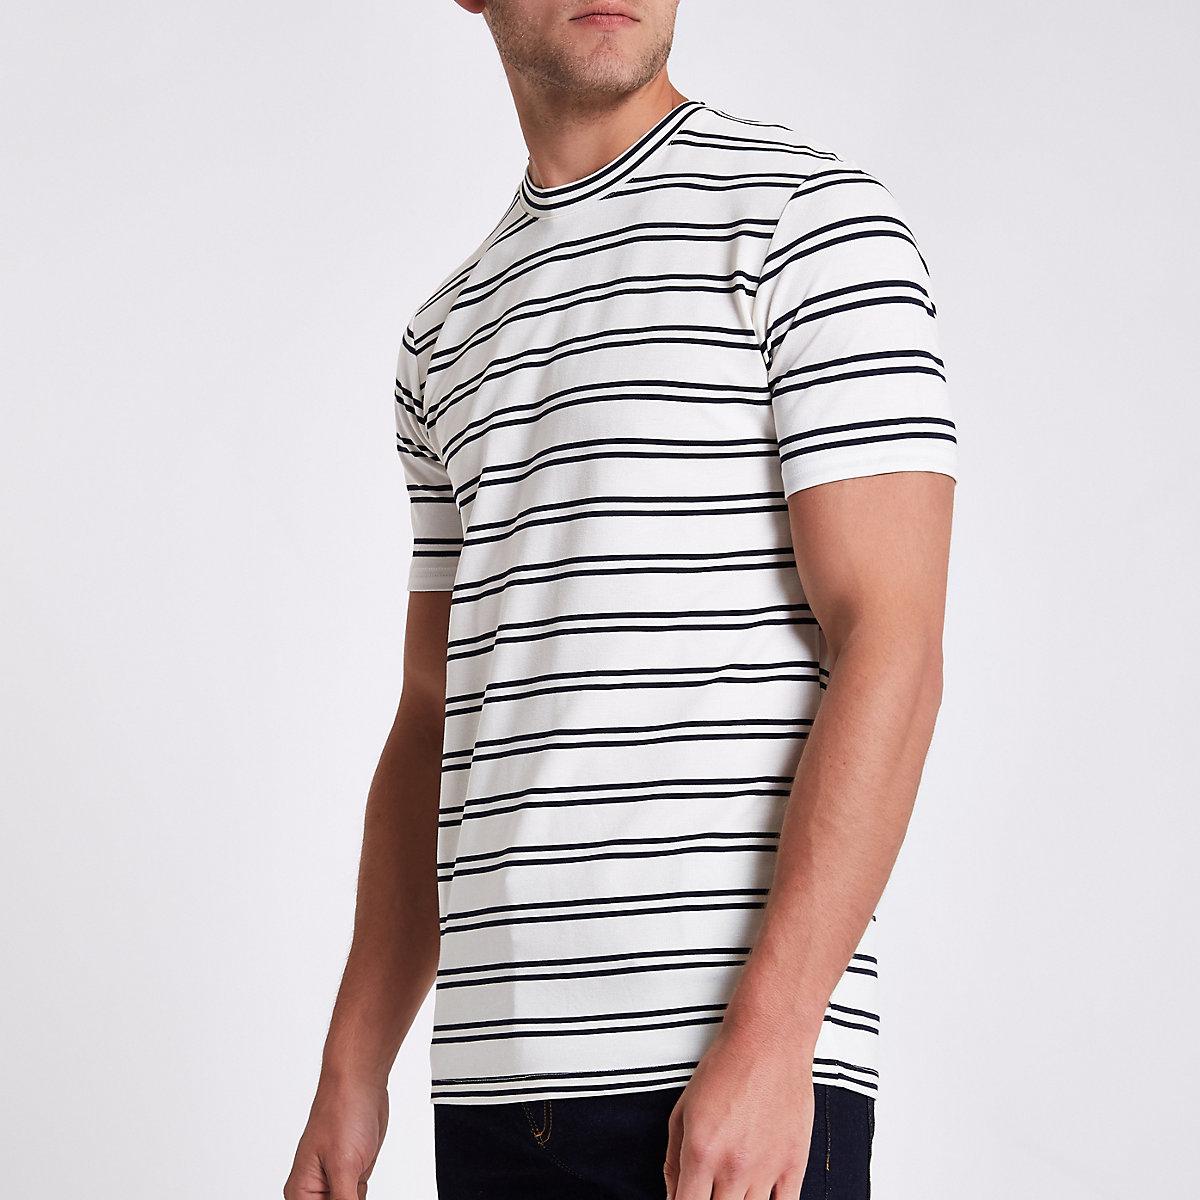 Minimum white stripe T-shirt